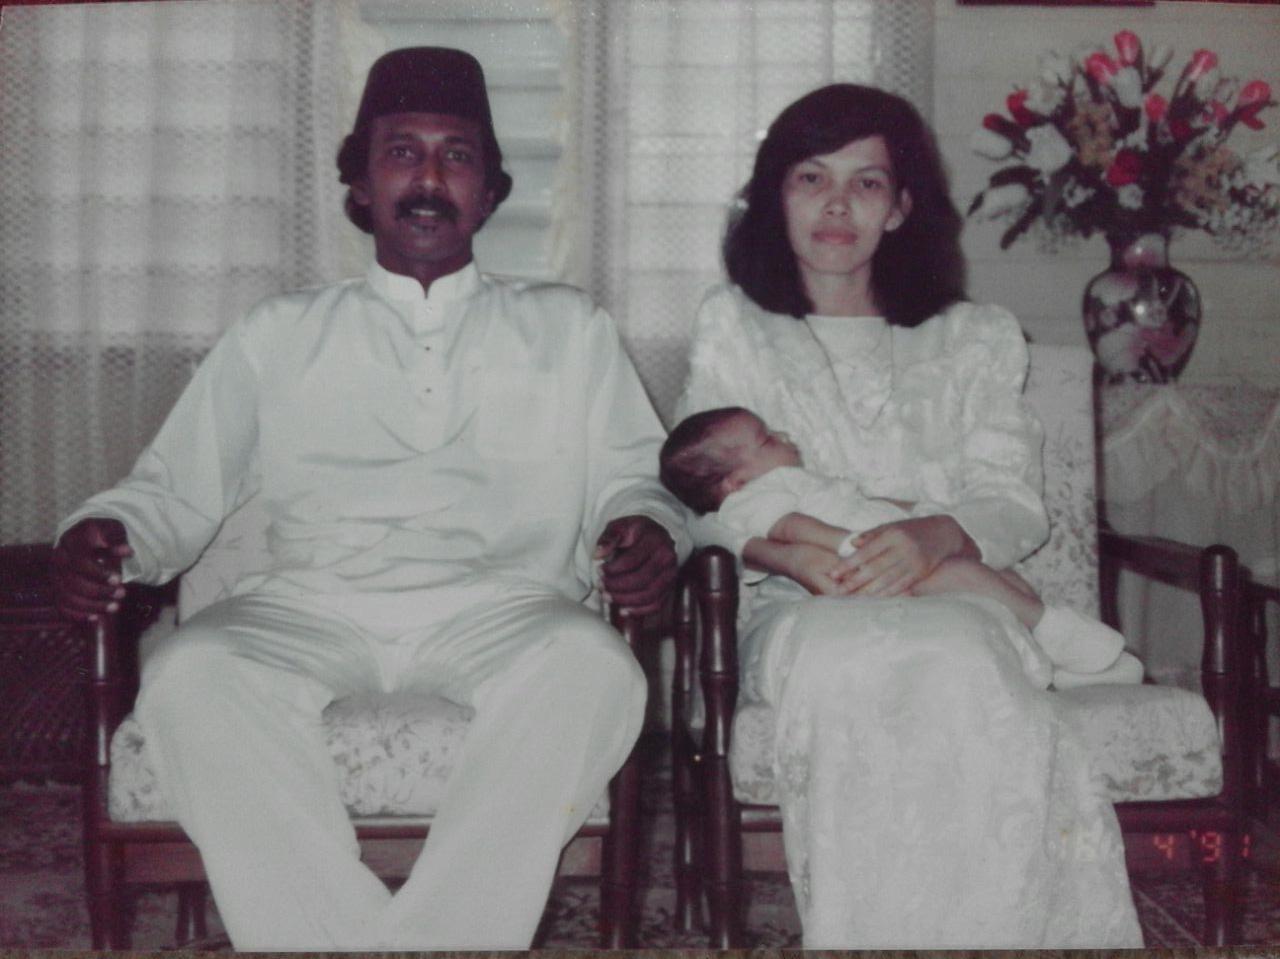 Mohamad Redza Ramadas Abdullah and wife, Halimah Baharudin with their first child, Redzalina